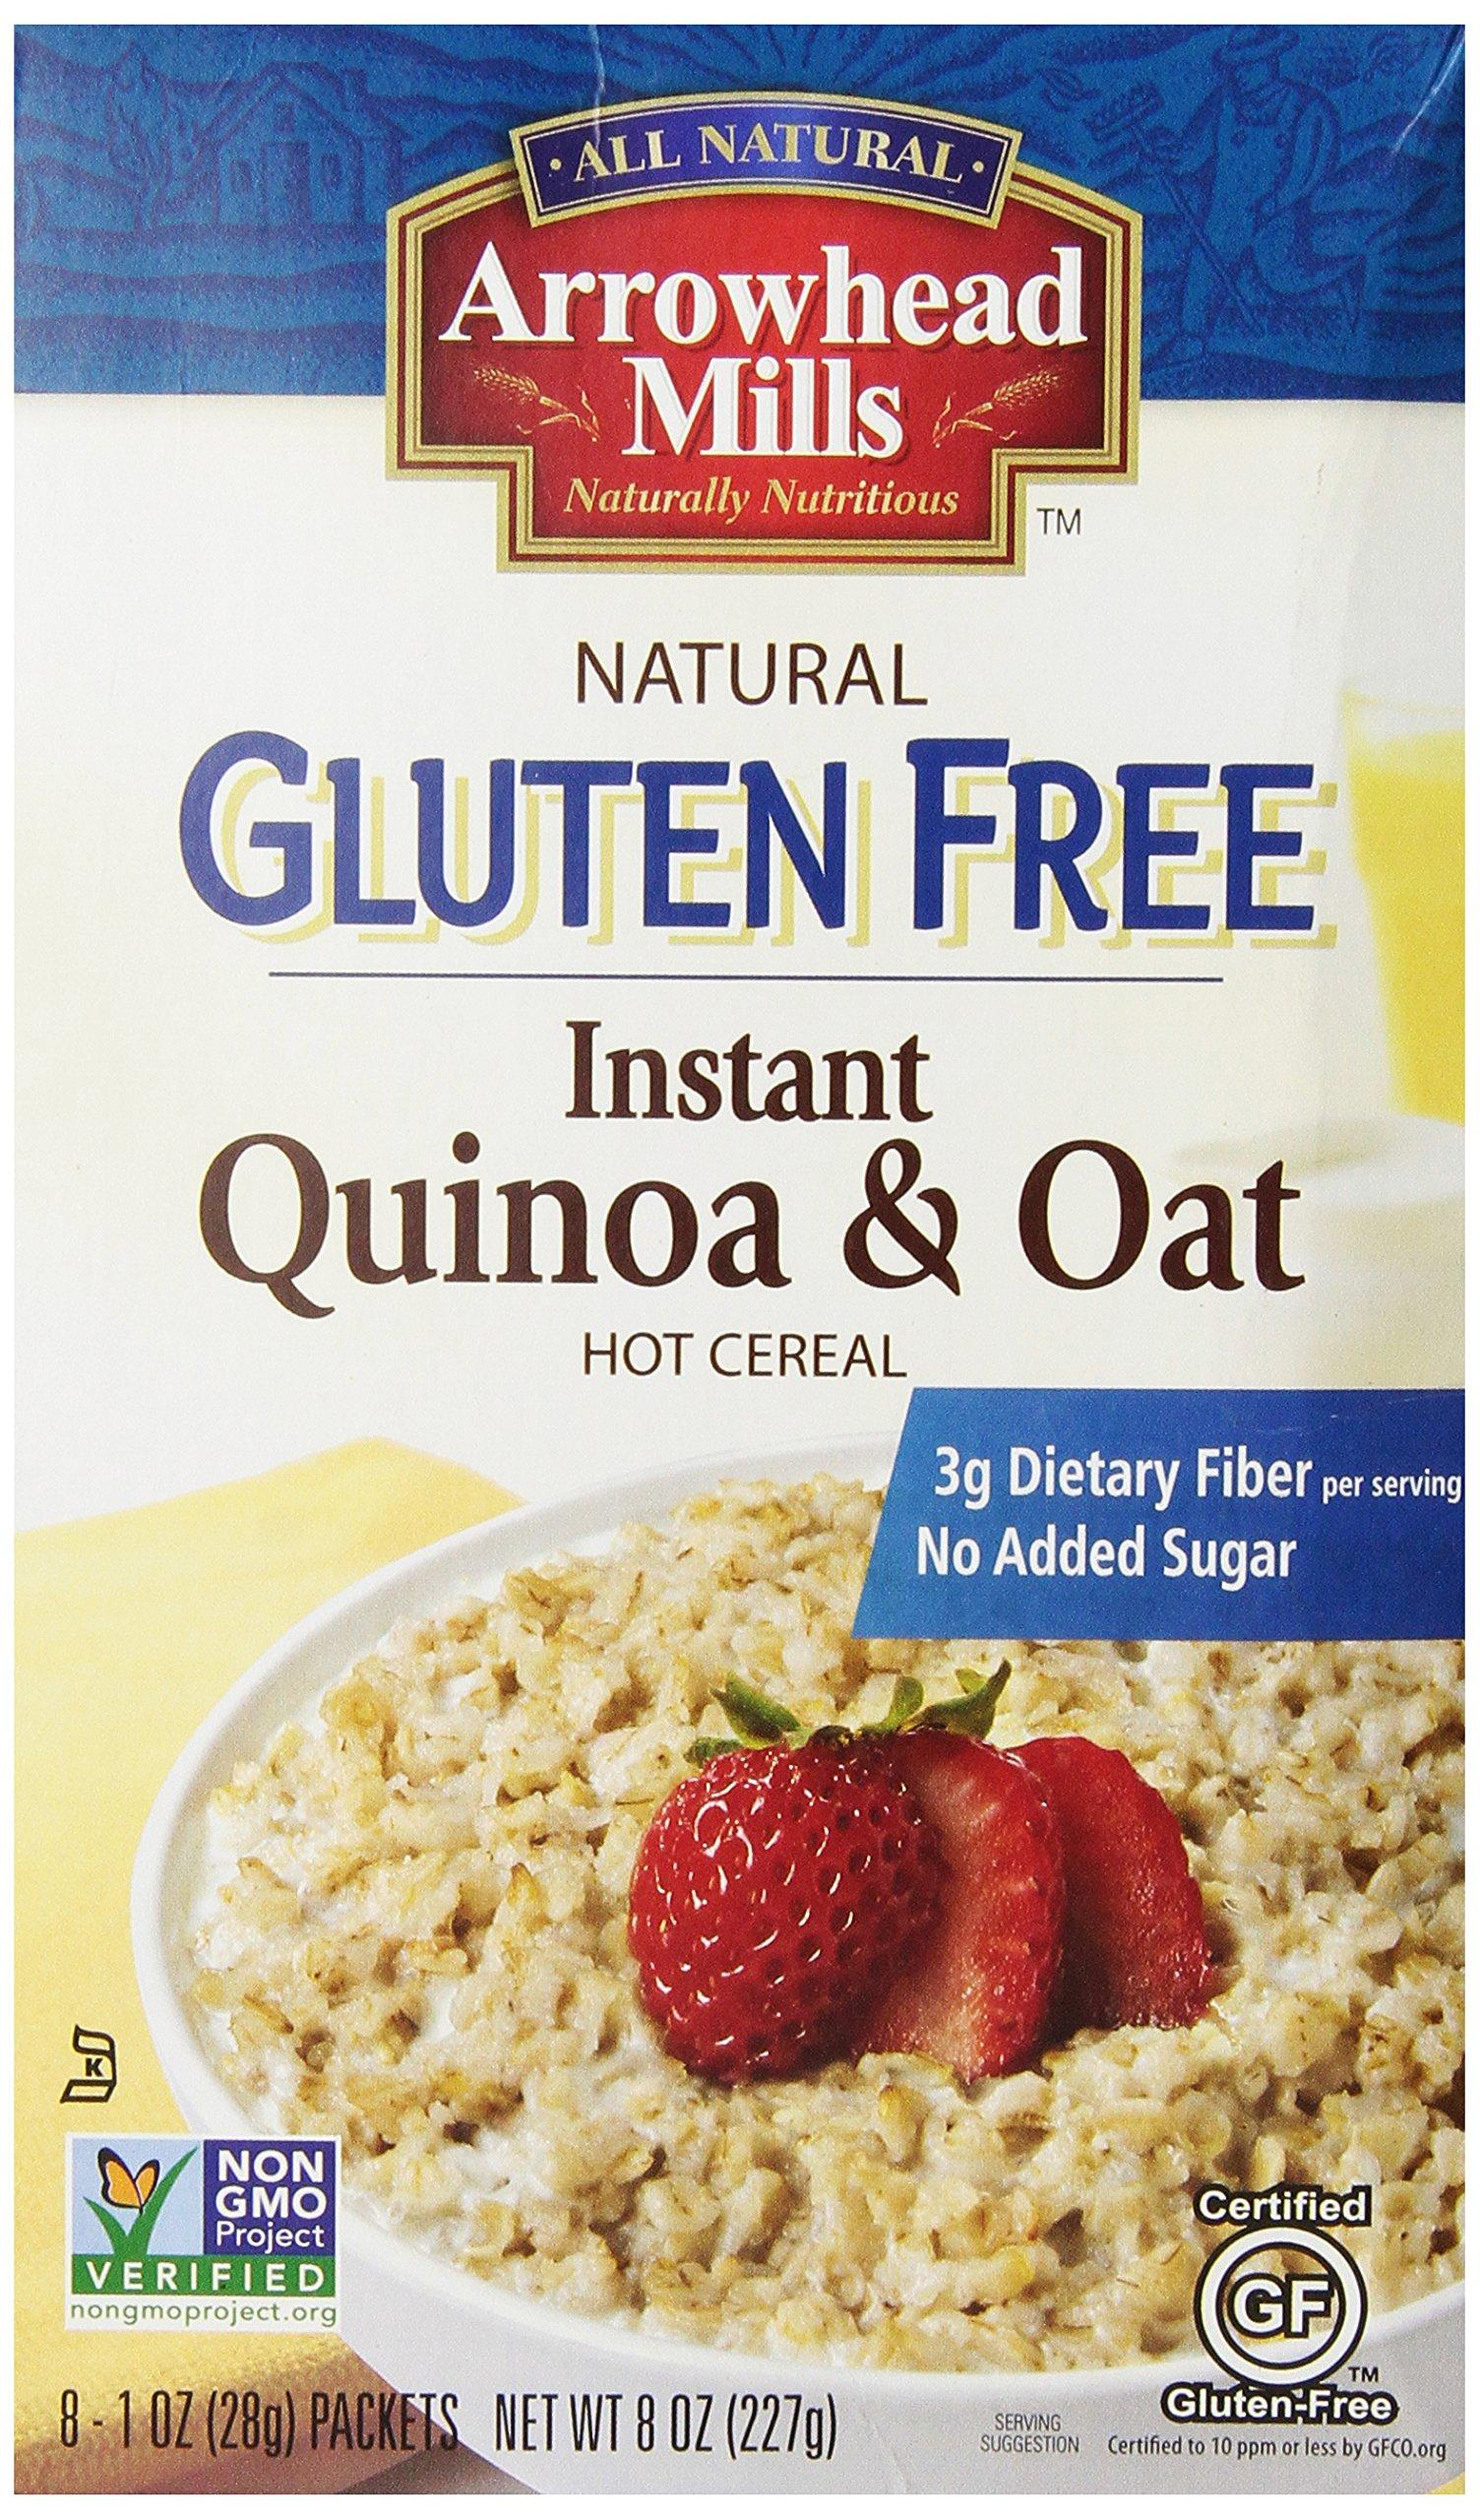 Arrowhead Mills Gluten Free Instant Quinoa & Oat, 1 Ounce (8 Count)